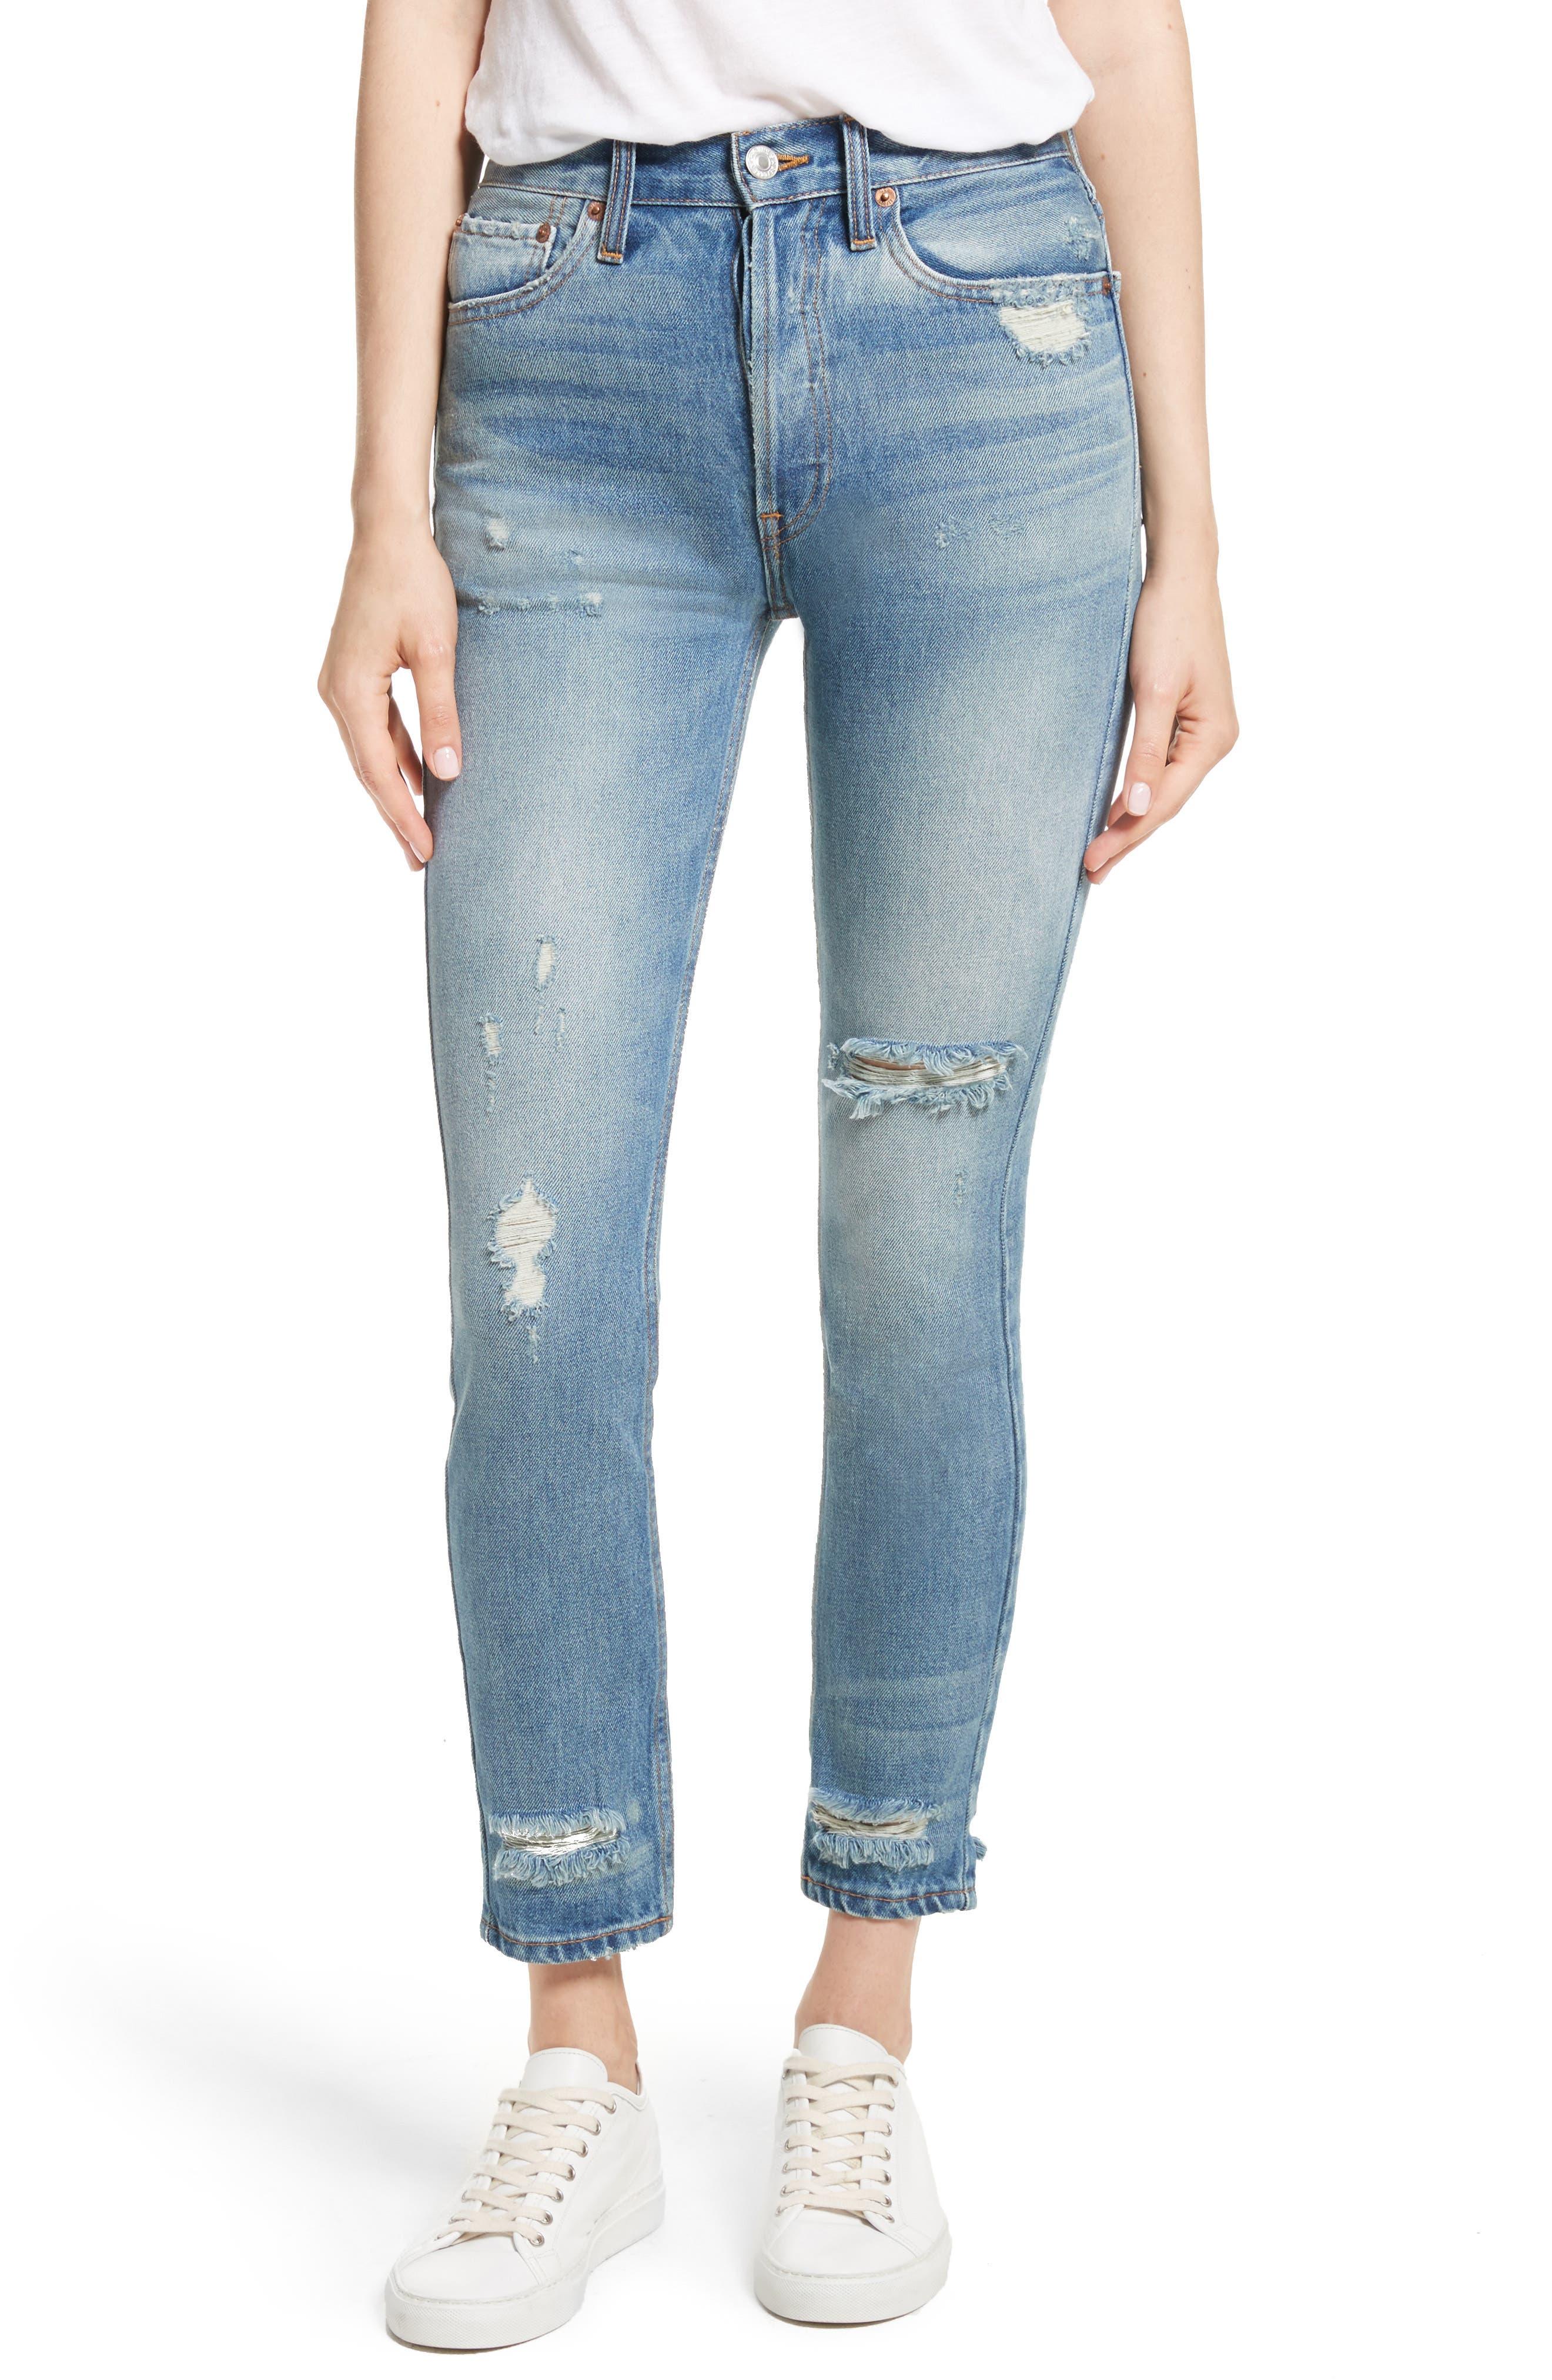 Originals High Waist Jeans,                         Main,                         color, 401